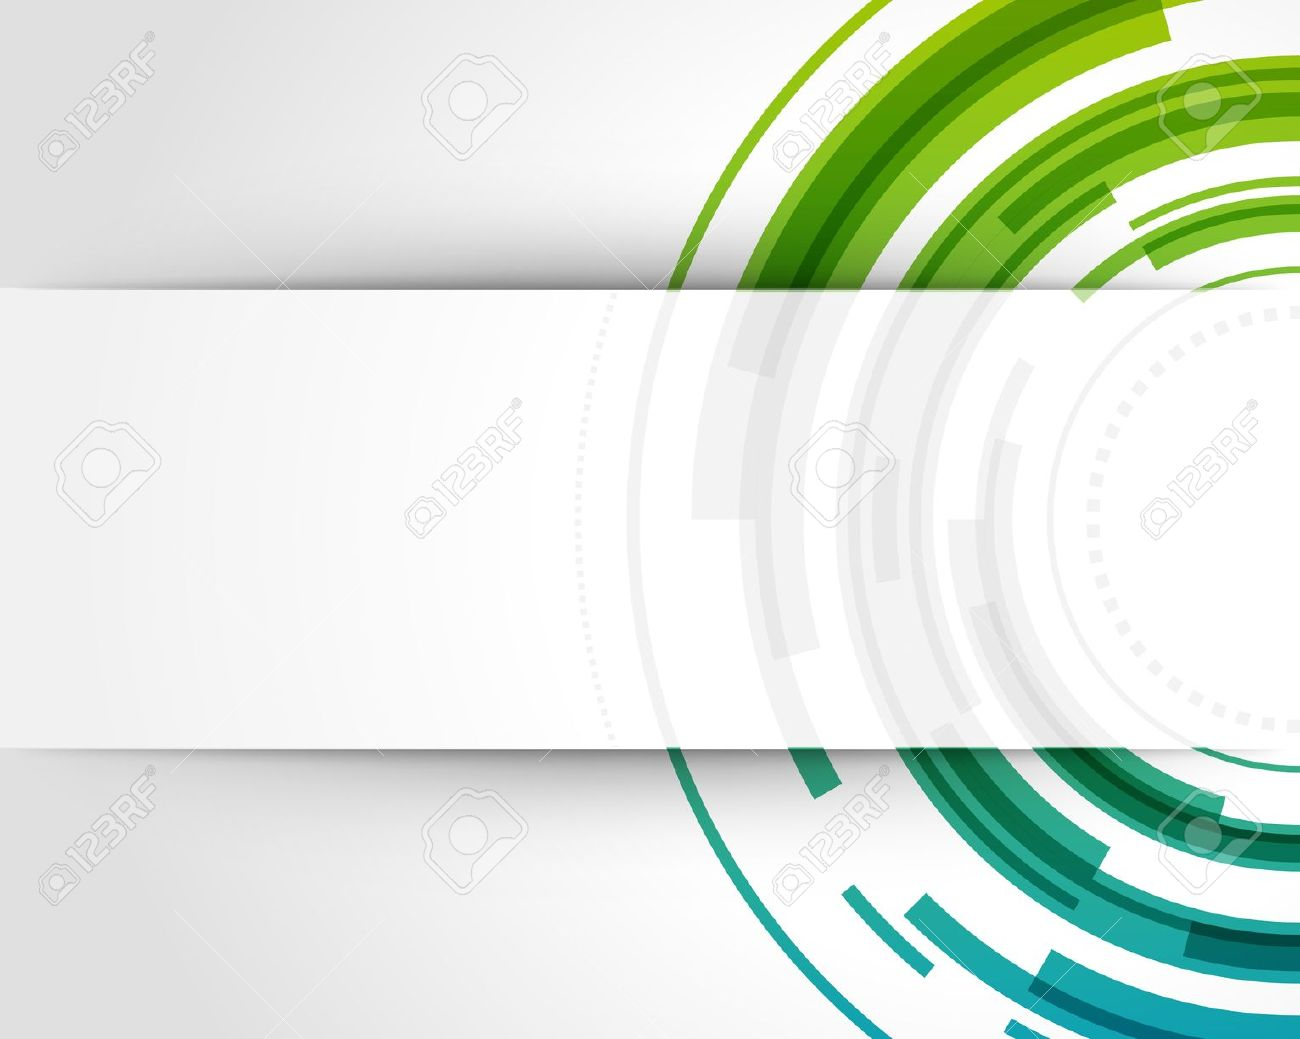 Free Download Wallpaper Apple 3d Vector Photo 6464 Hdwpro